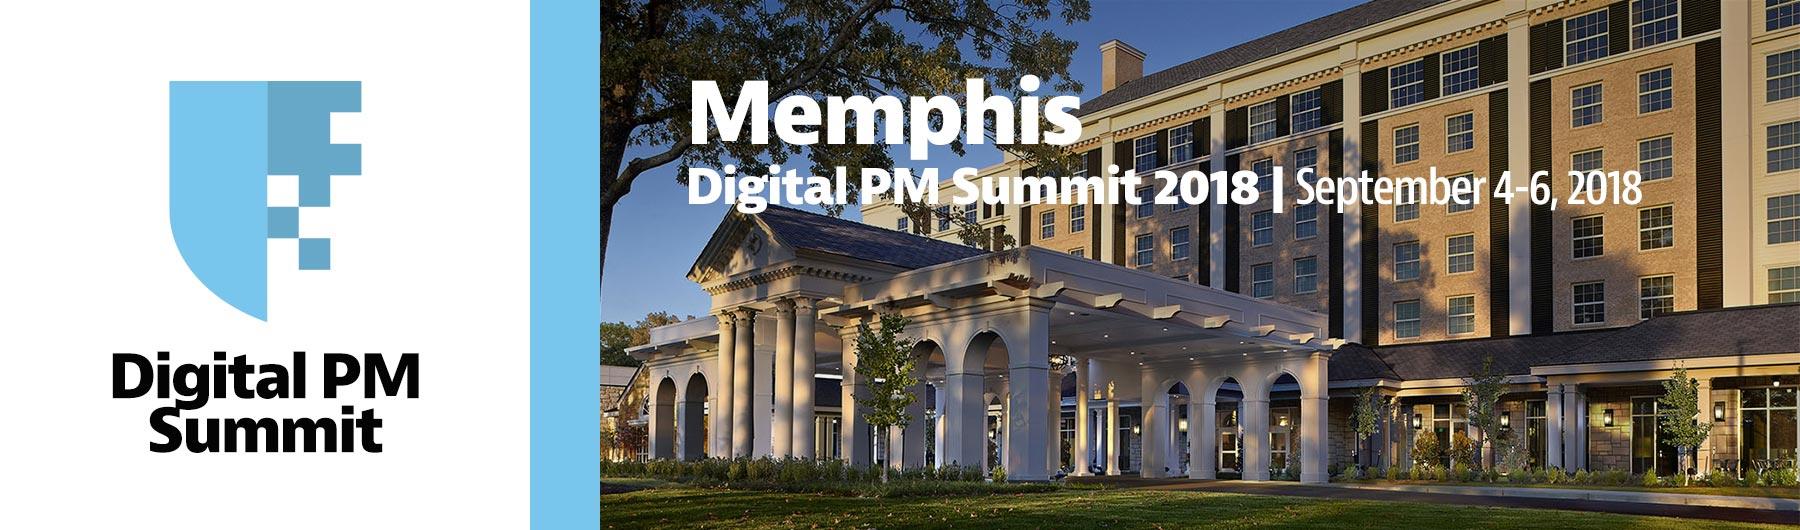 COMPLETE: Digital PM Summit 2018 | Memphis